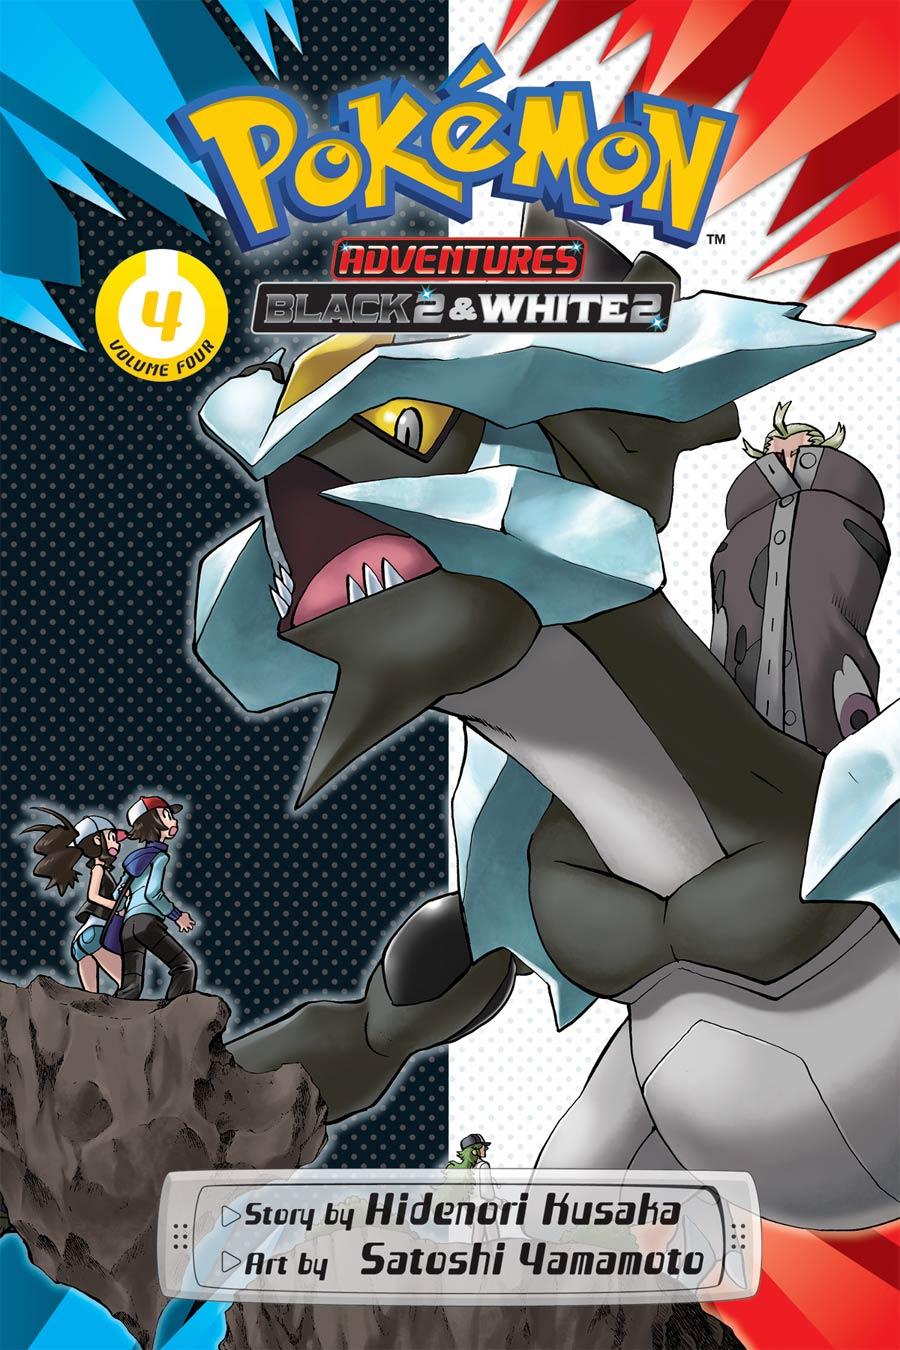 Pokemon Adventures Black 2 & White 2 Vol 4 GN